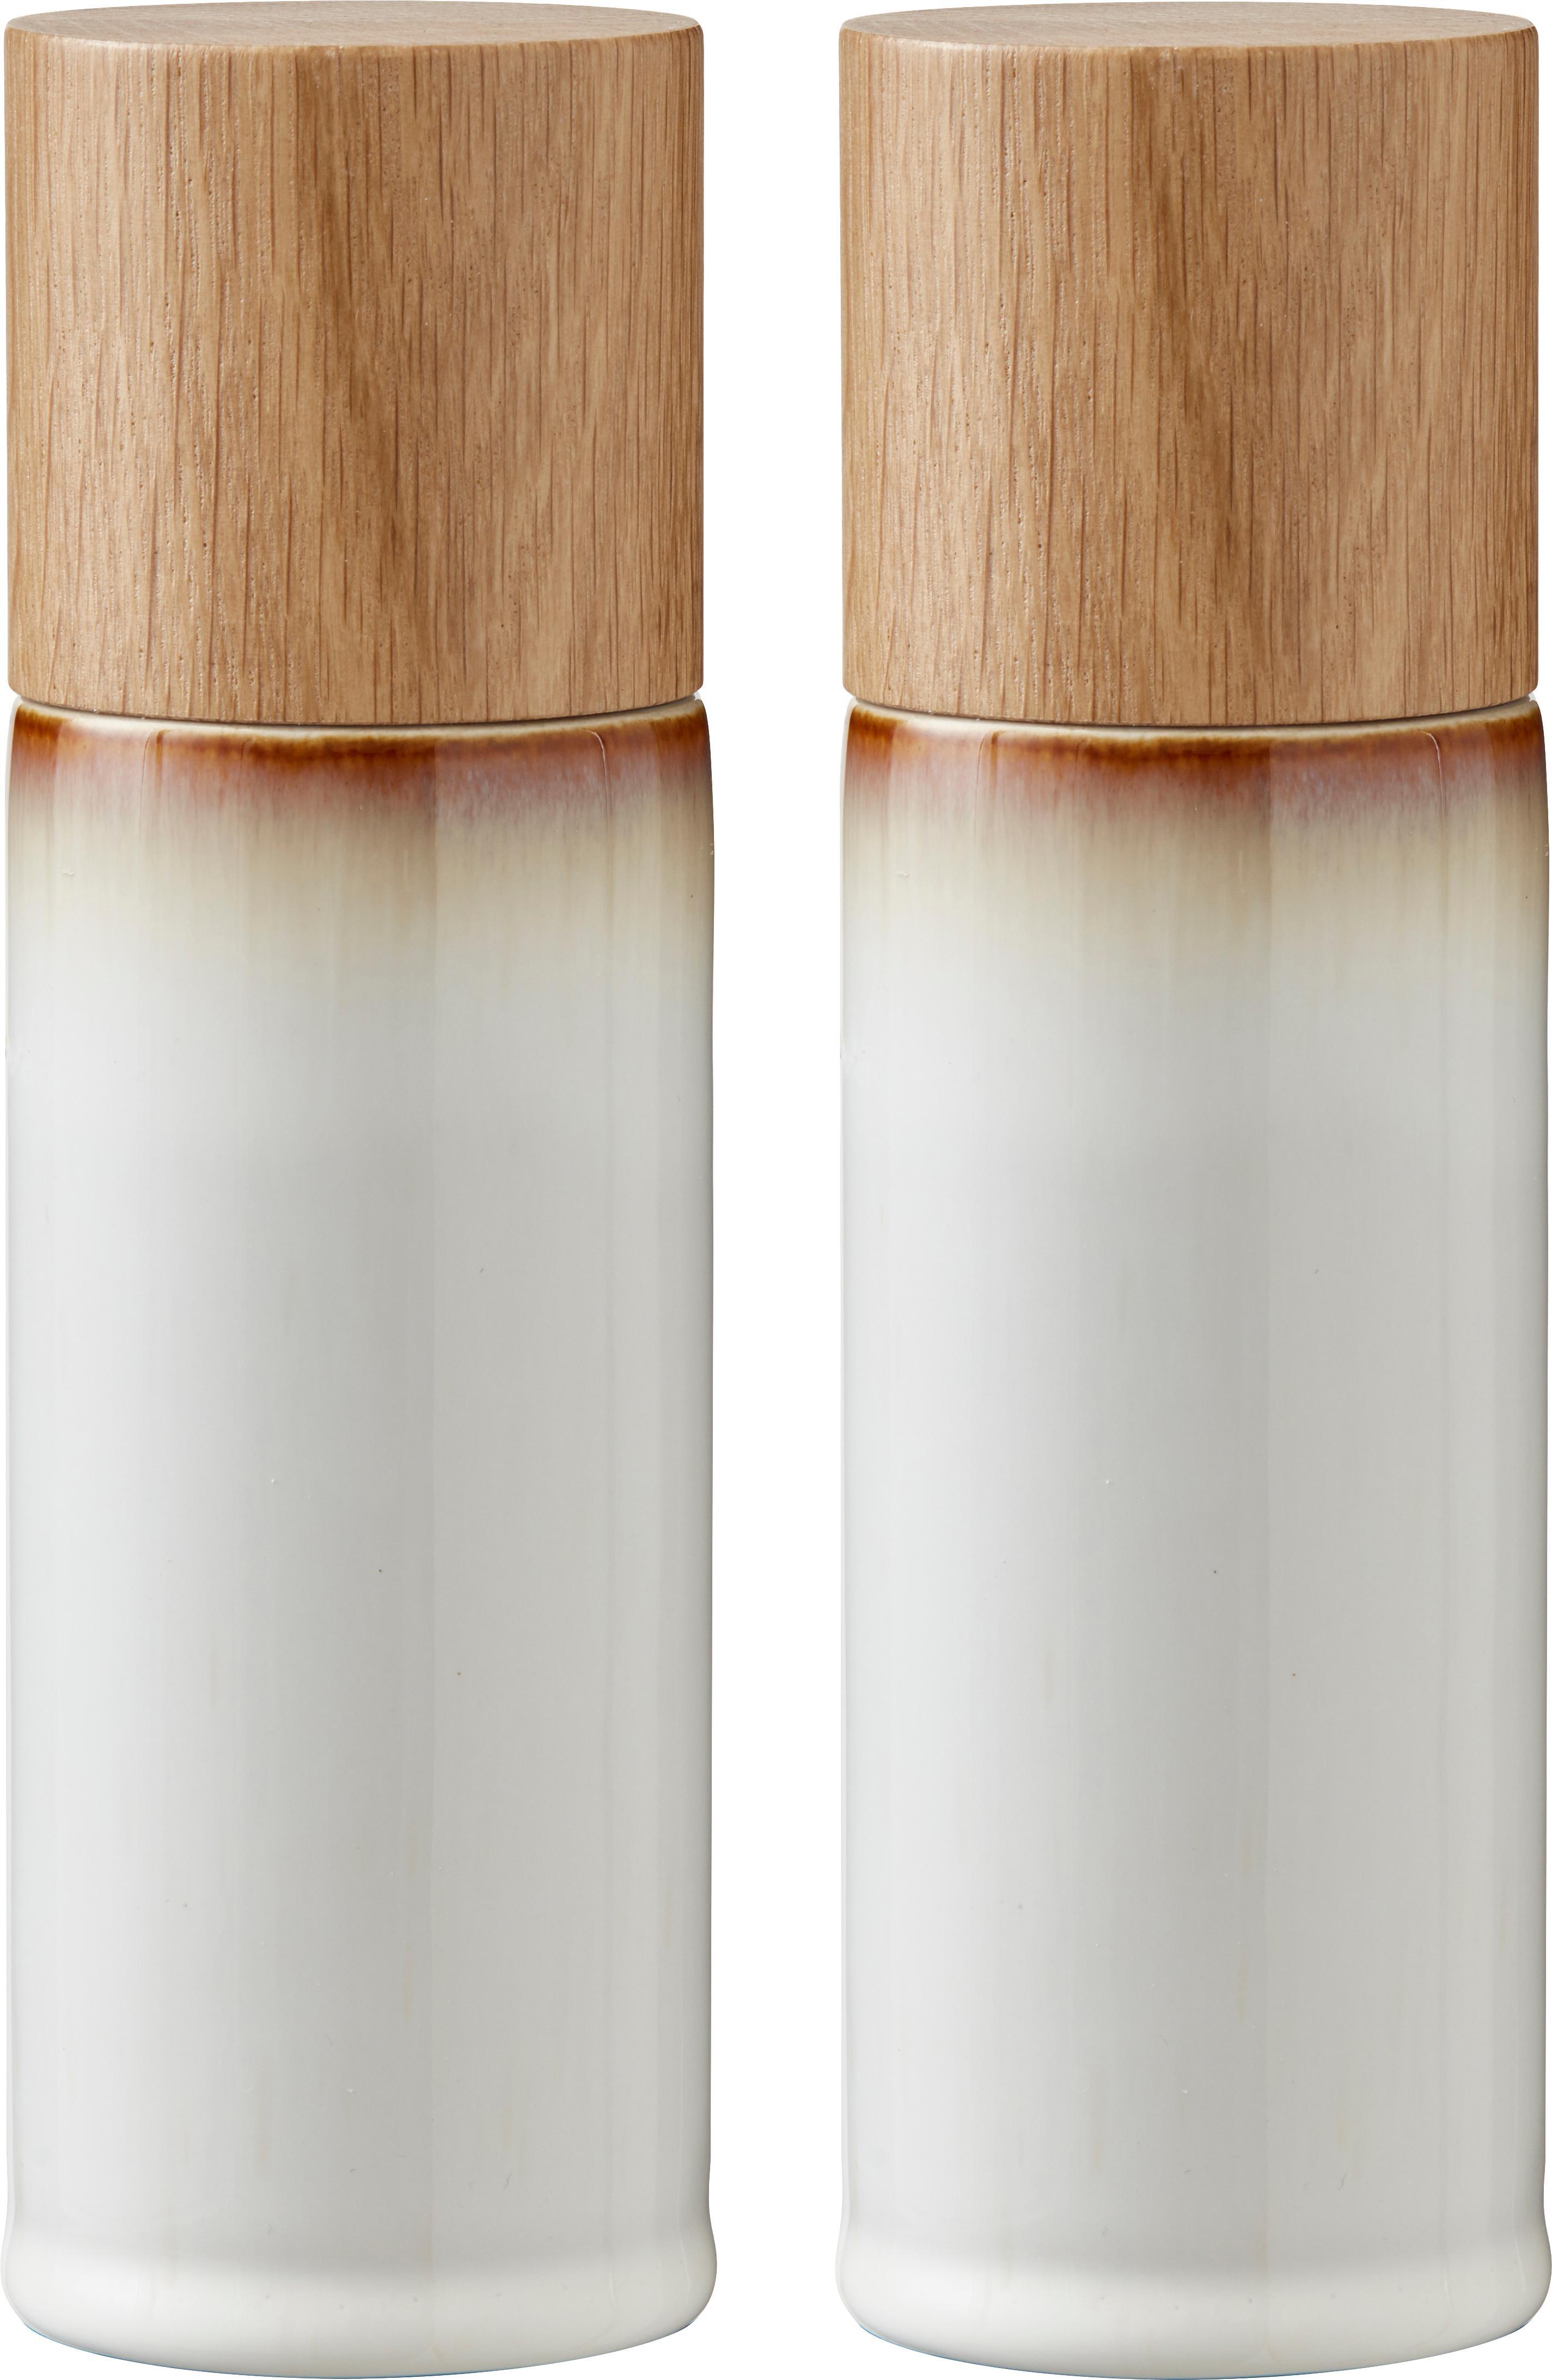 Set macina spezie Bizz 2 pz, Coperchio: legno di quercia, Bianco crema, marrone, legno, Ø 5 x Alt. 17 cm